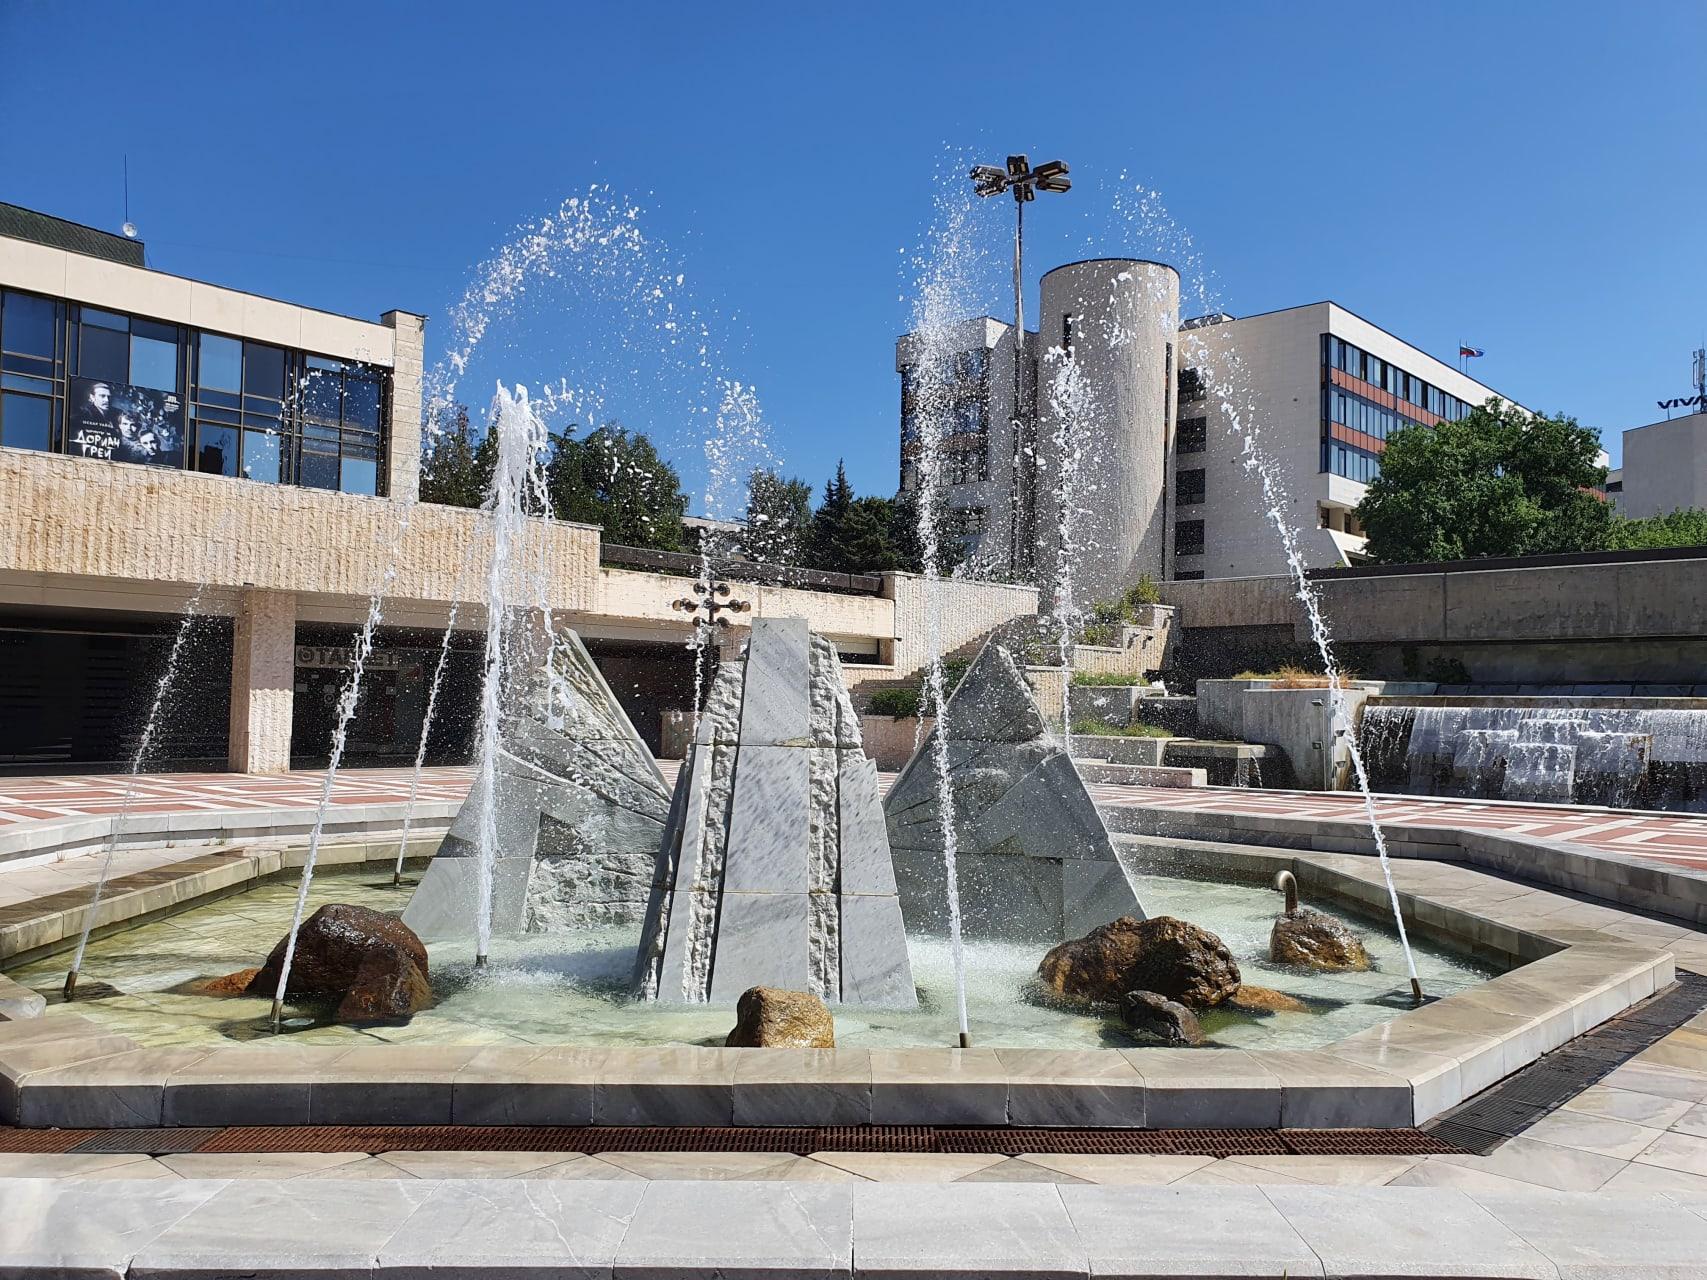 Blagoevgrad - The Last Town of Socialism